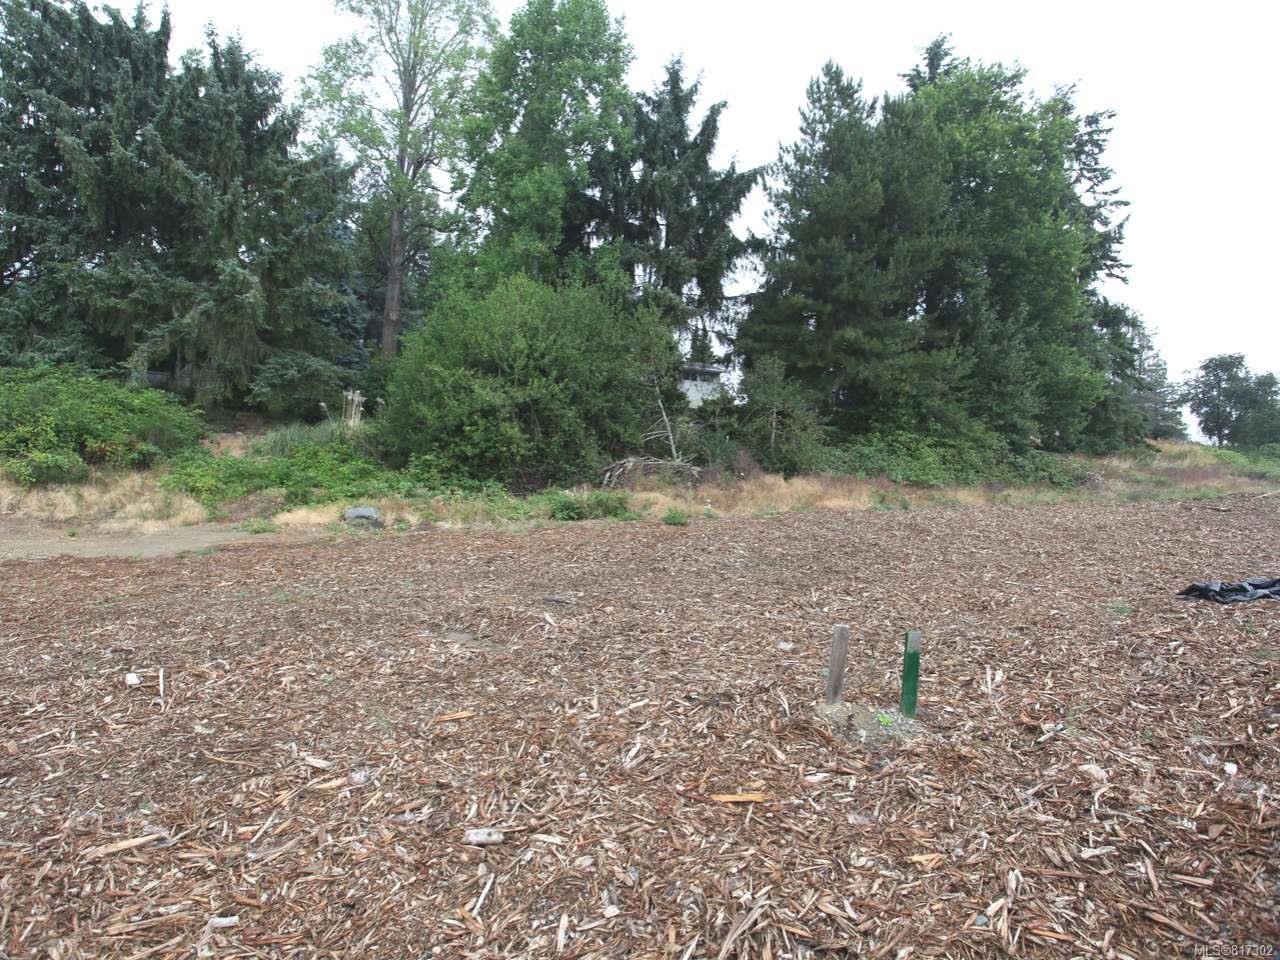 Main Photo: 538 Menzies Ridge Dr in NANAIMO: Na University District Land for sale (Nanaimo)  : MLS®# 817302